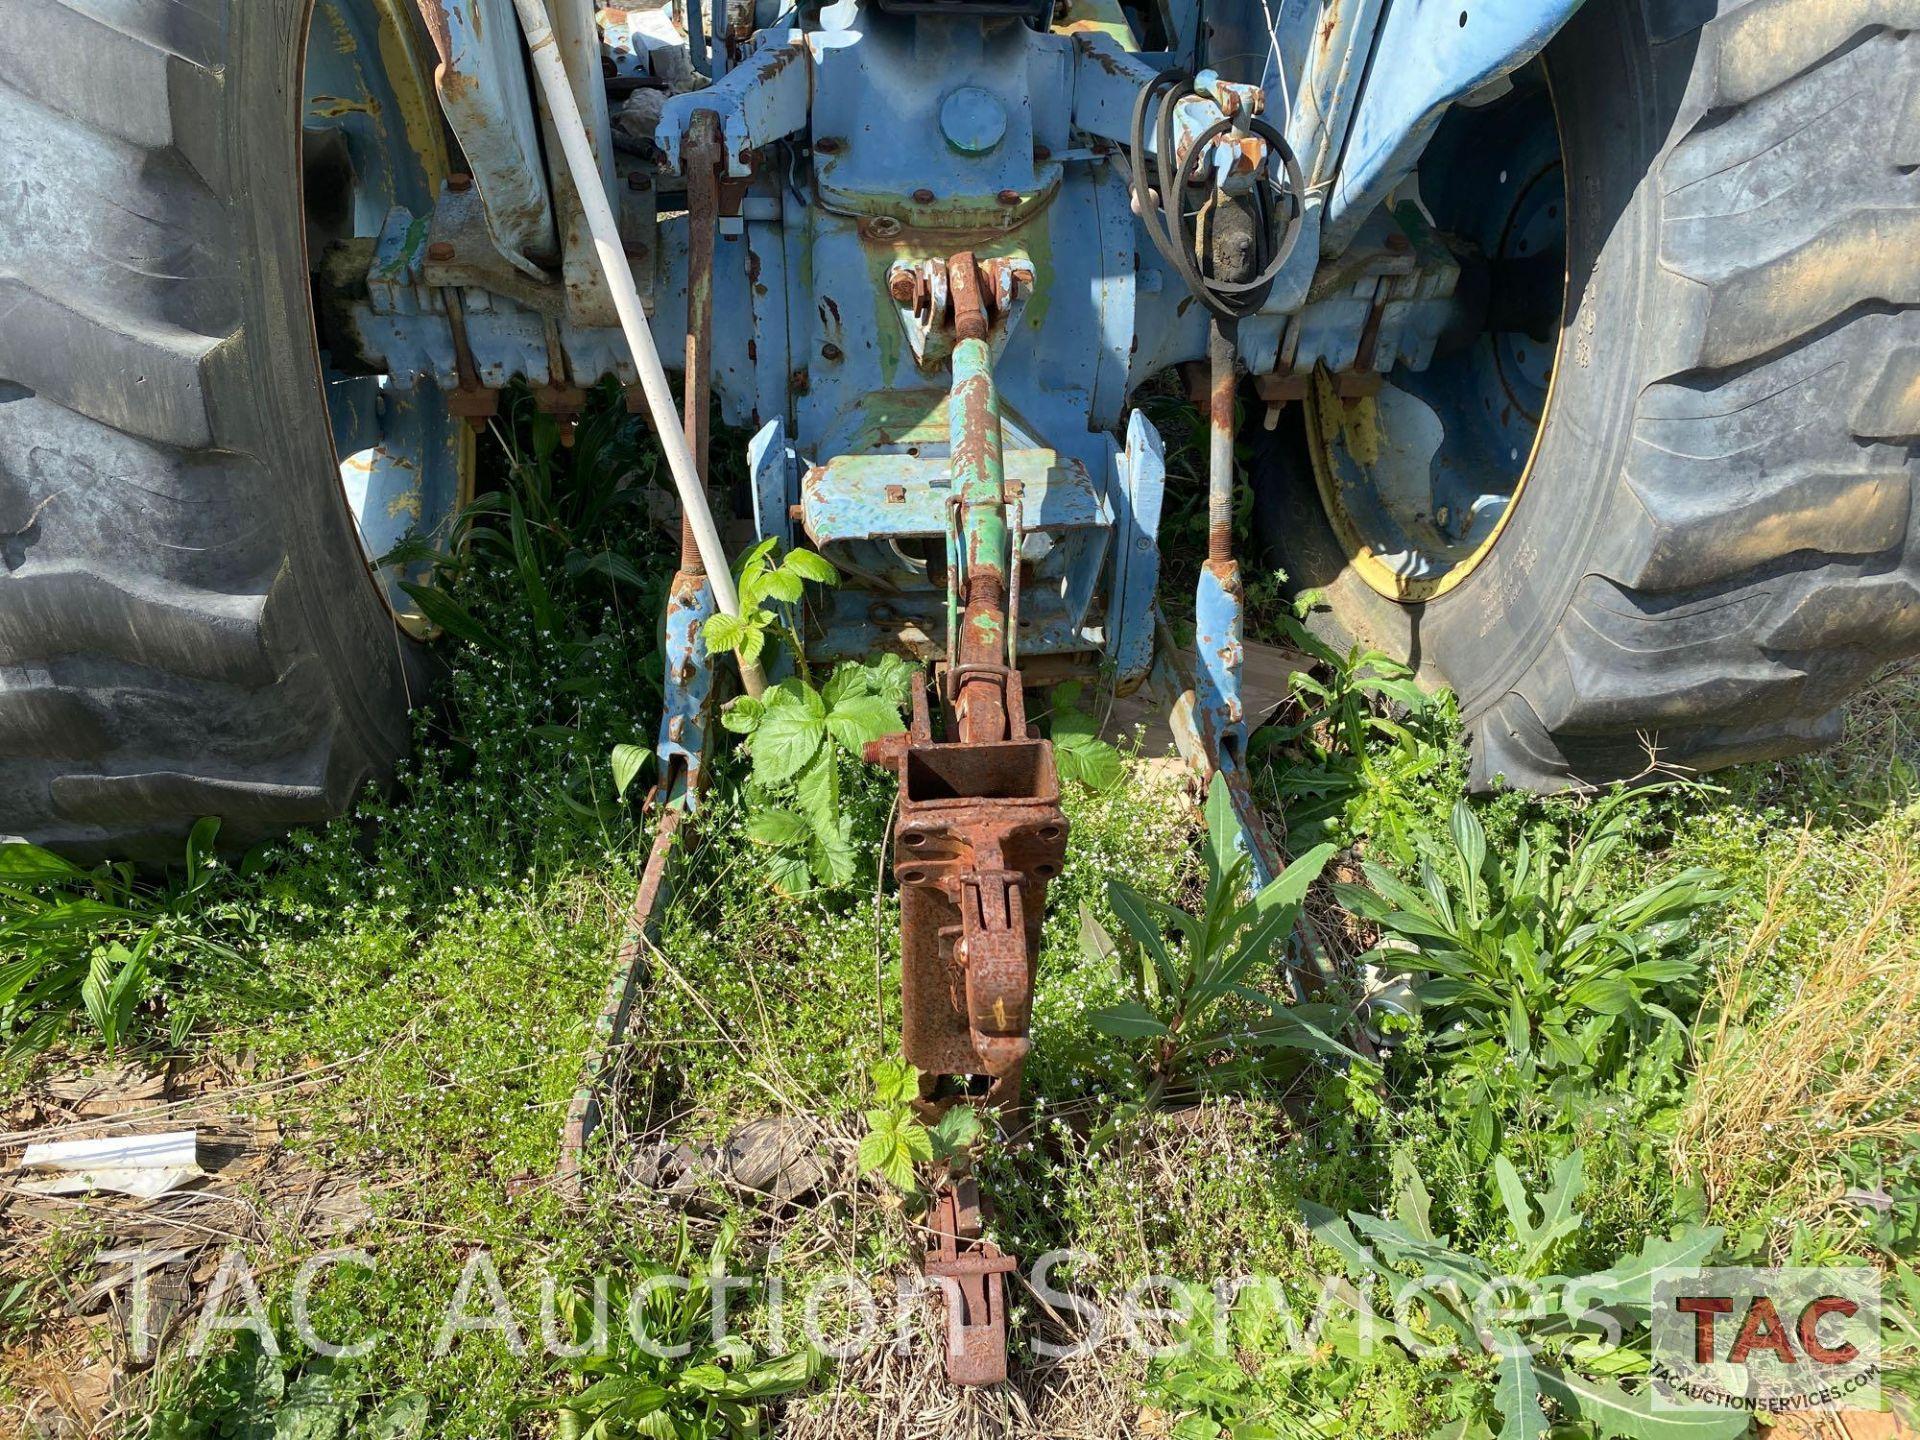 John Deere 2150 Farm Tractor - Image 10 of 34